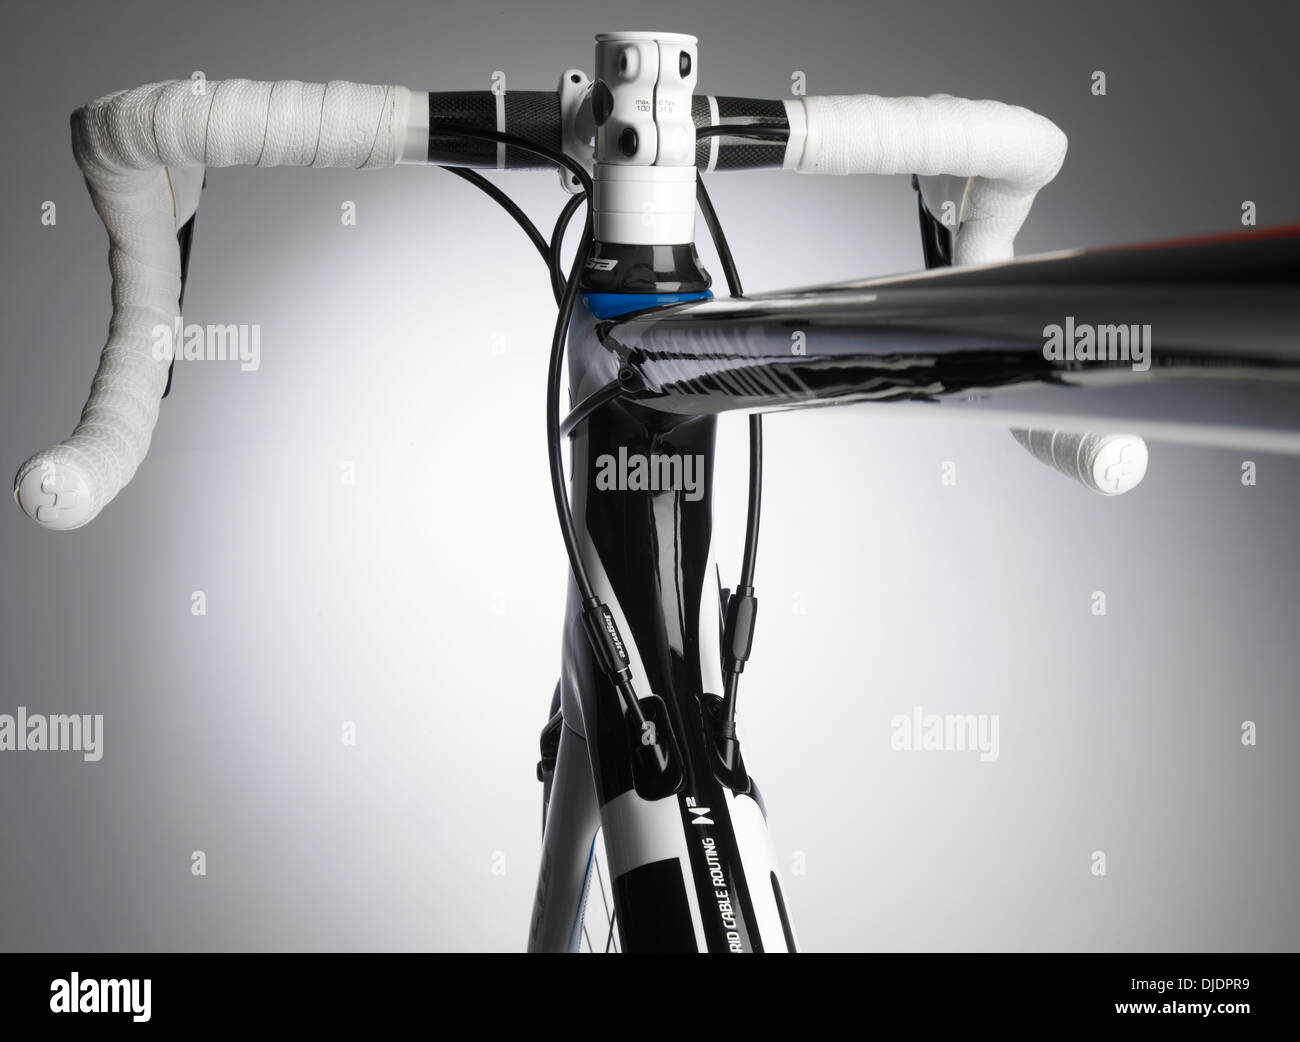 Road bicycle handlebars - Stock Image